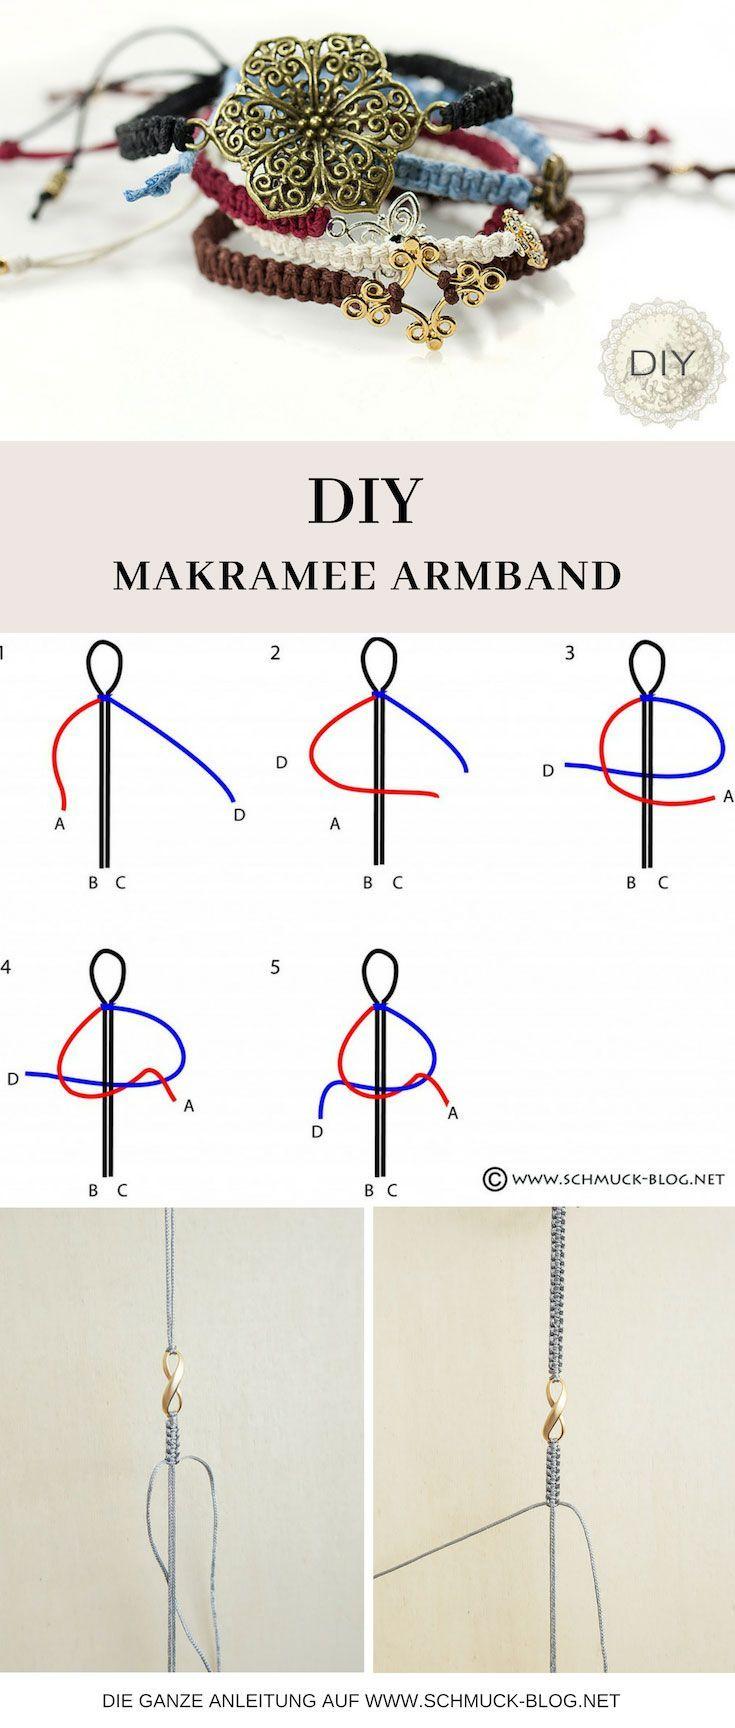 Photo of Makramee Armbänder knüpfen – Einfache Anleitung